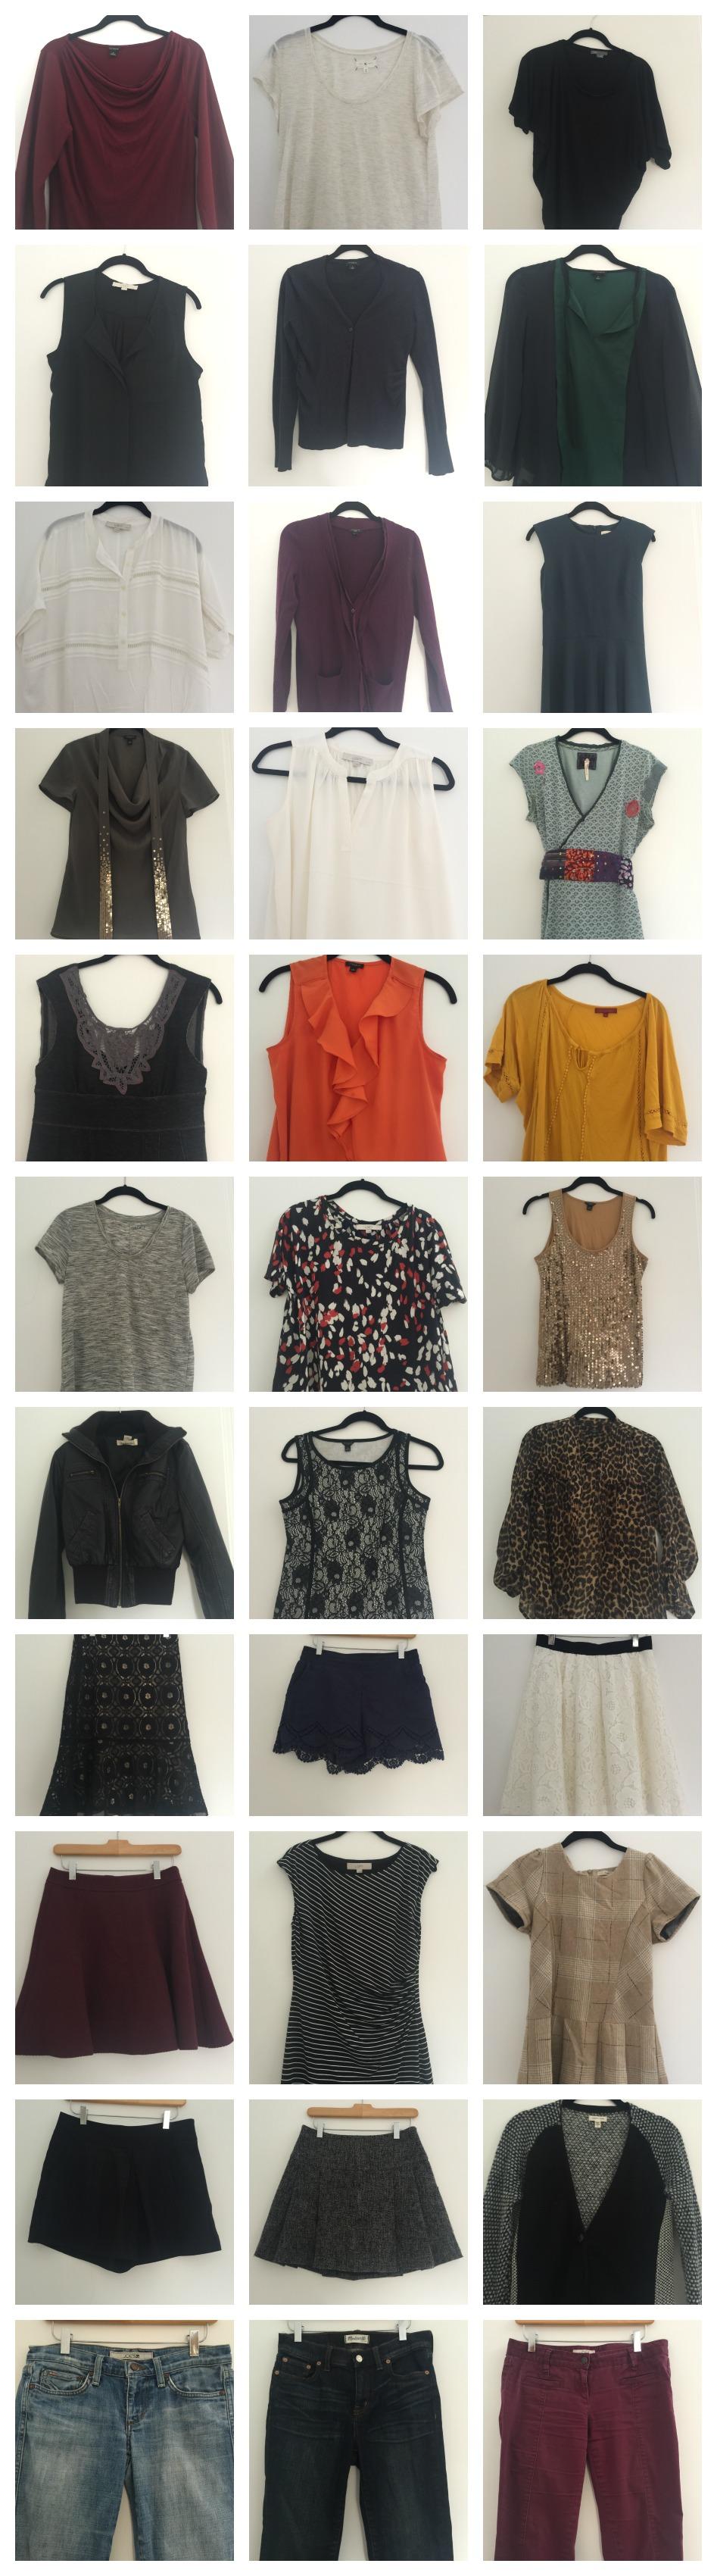 Fall capsule wardrobe- 33 pieces